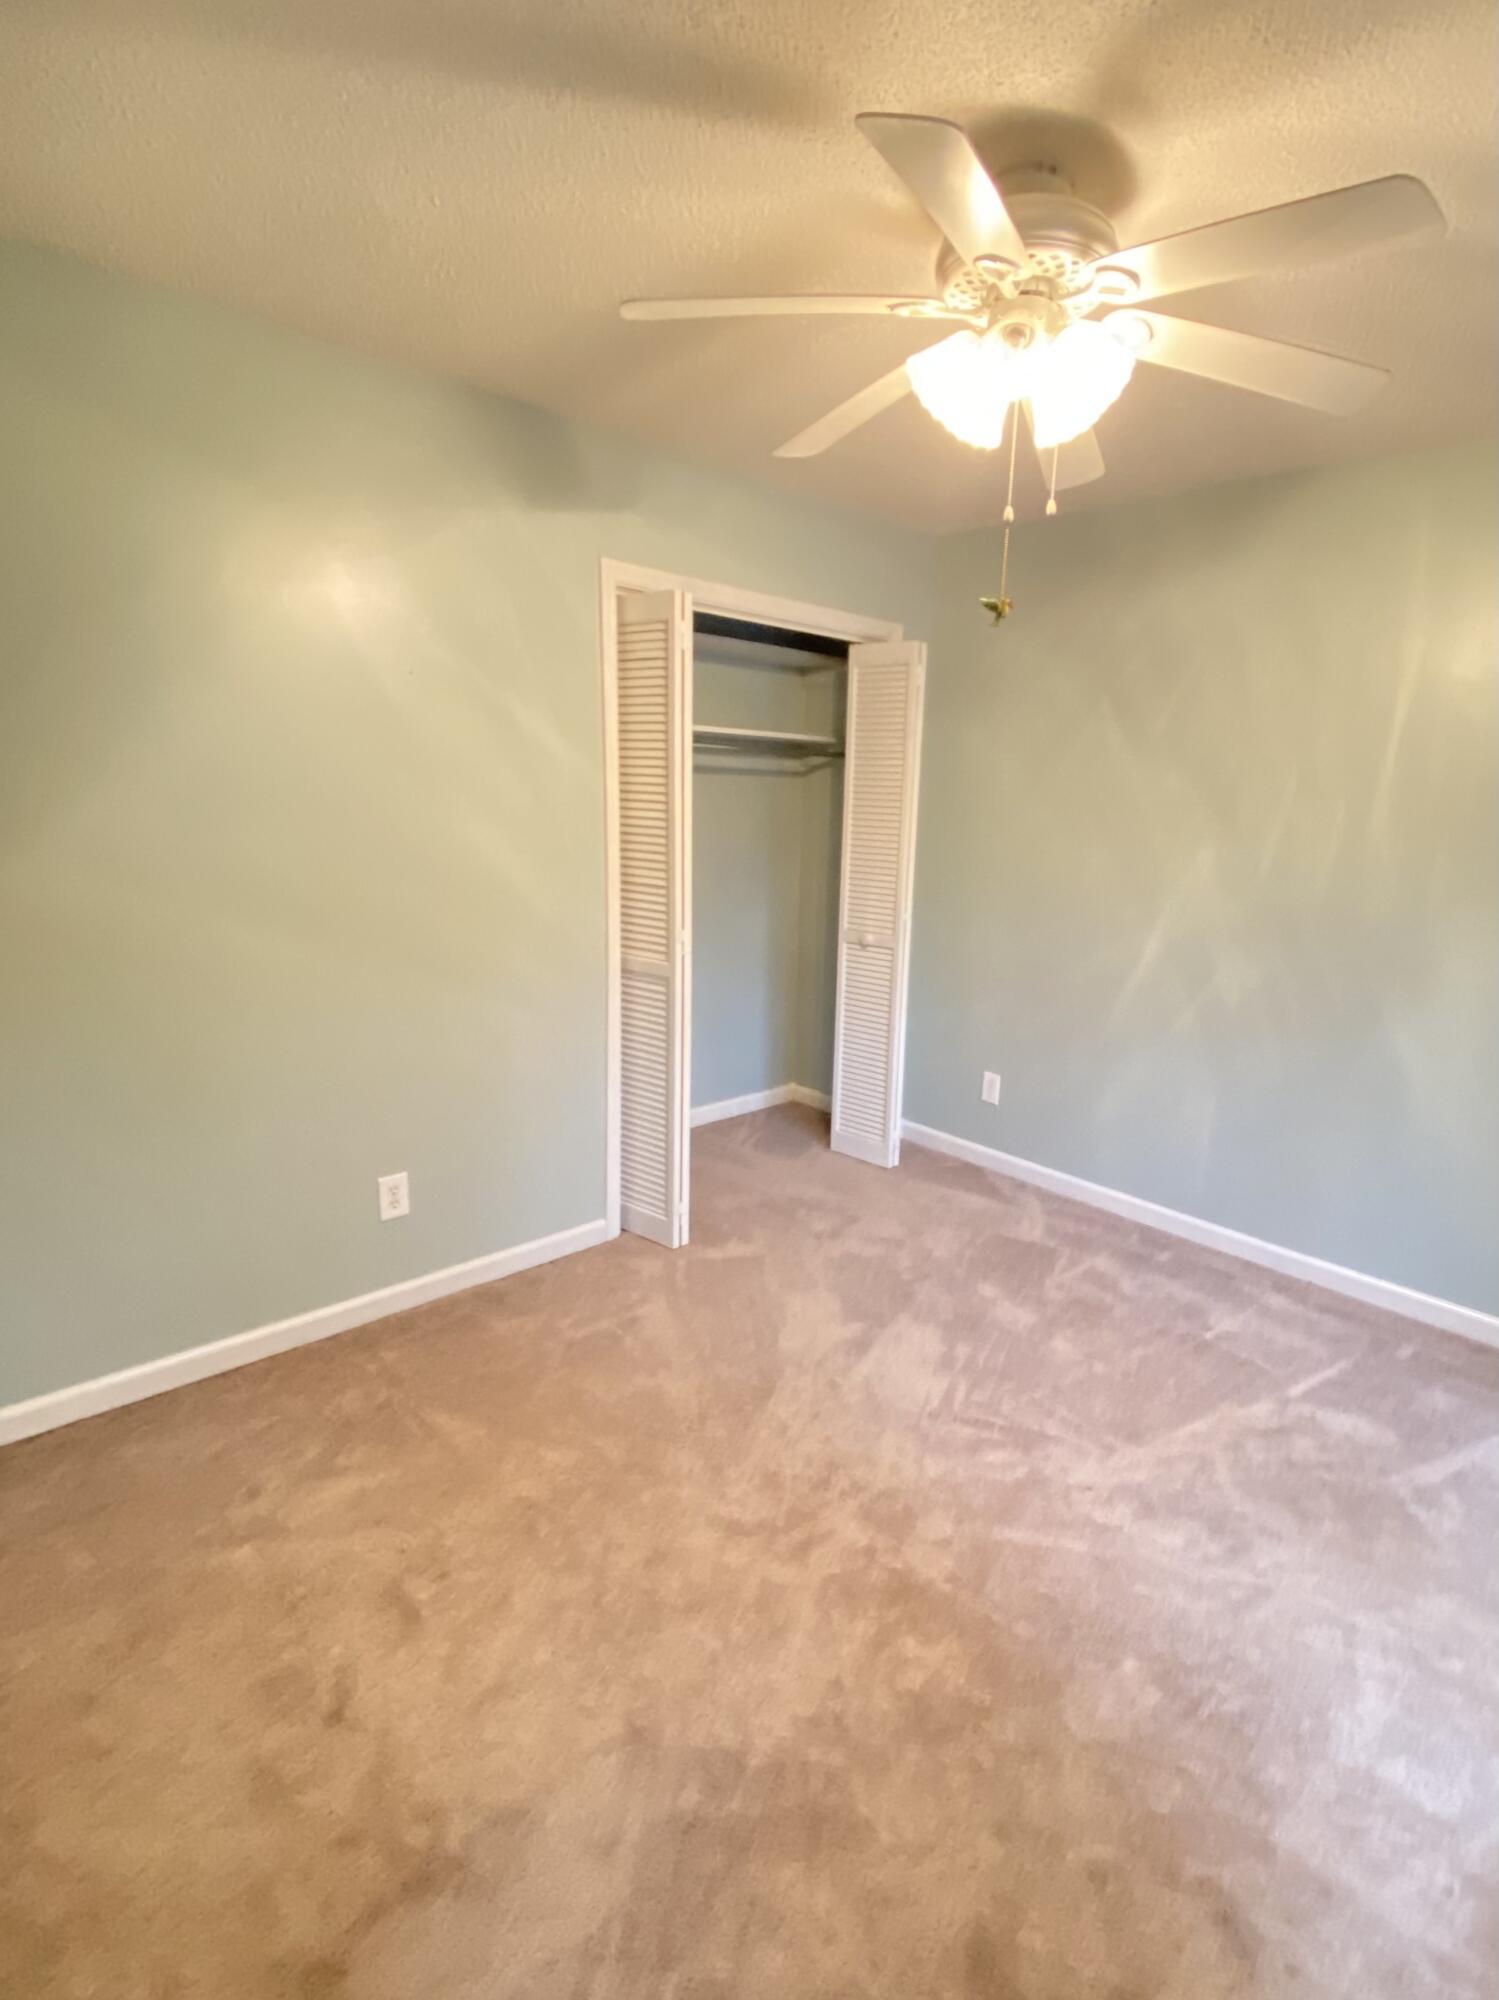 Palmetto Fort Homes For Sale - 1510 Lakeshore, Mount Pleasant, SC - 17